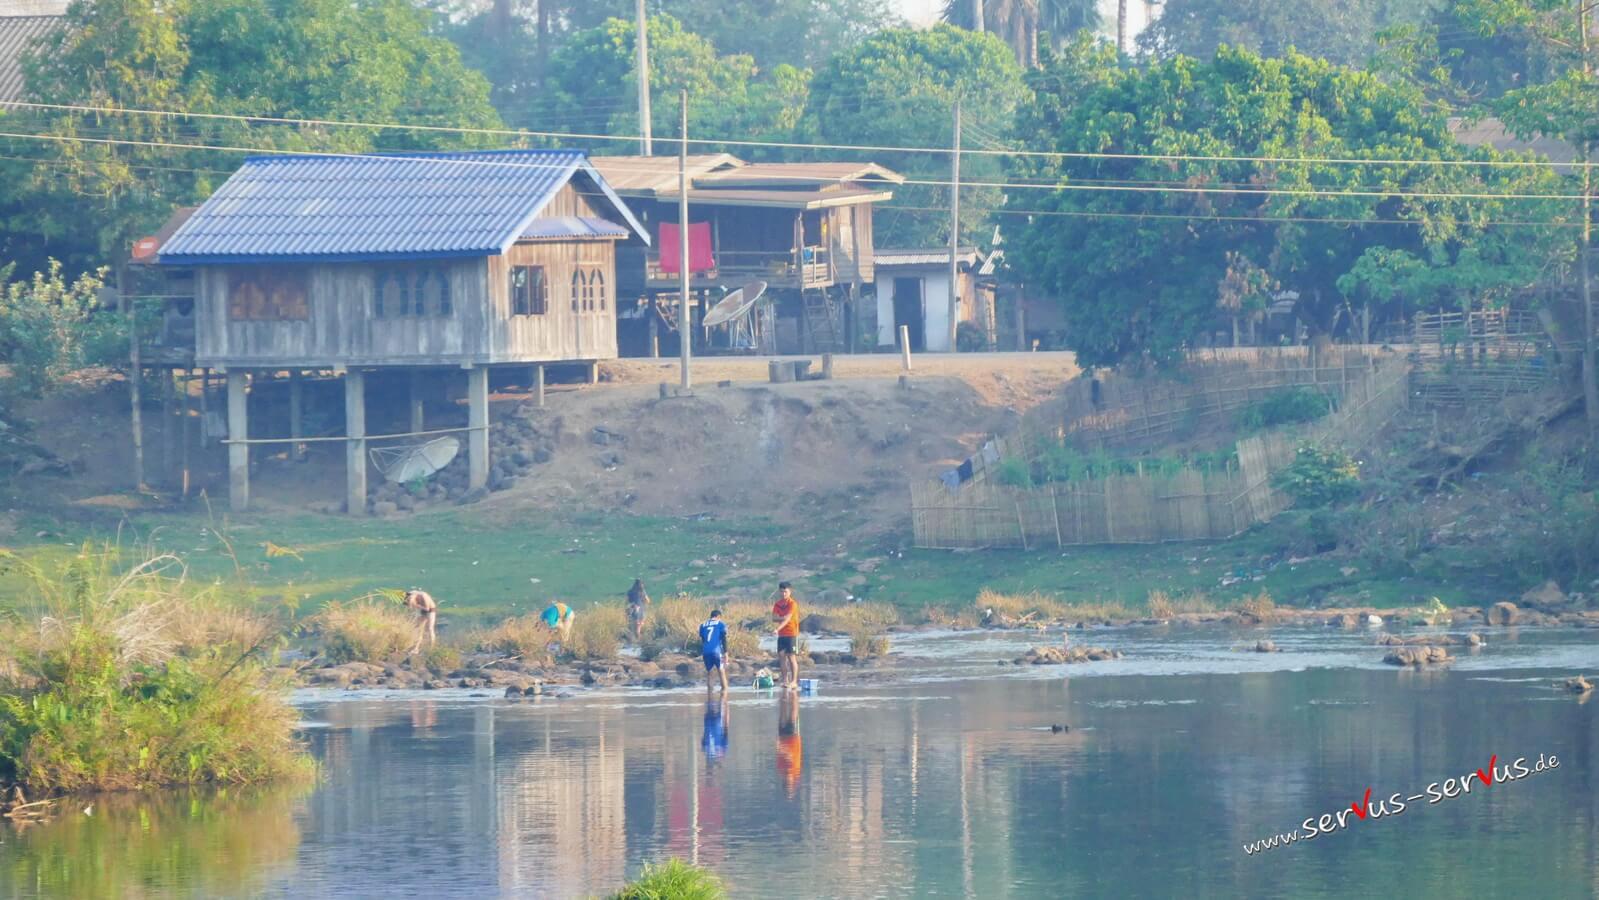 Laos, Tad Lo, Bolavenplateau, Menschen am Fluss